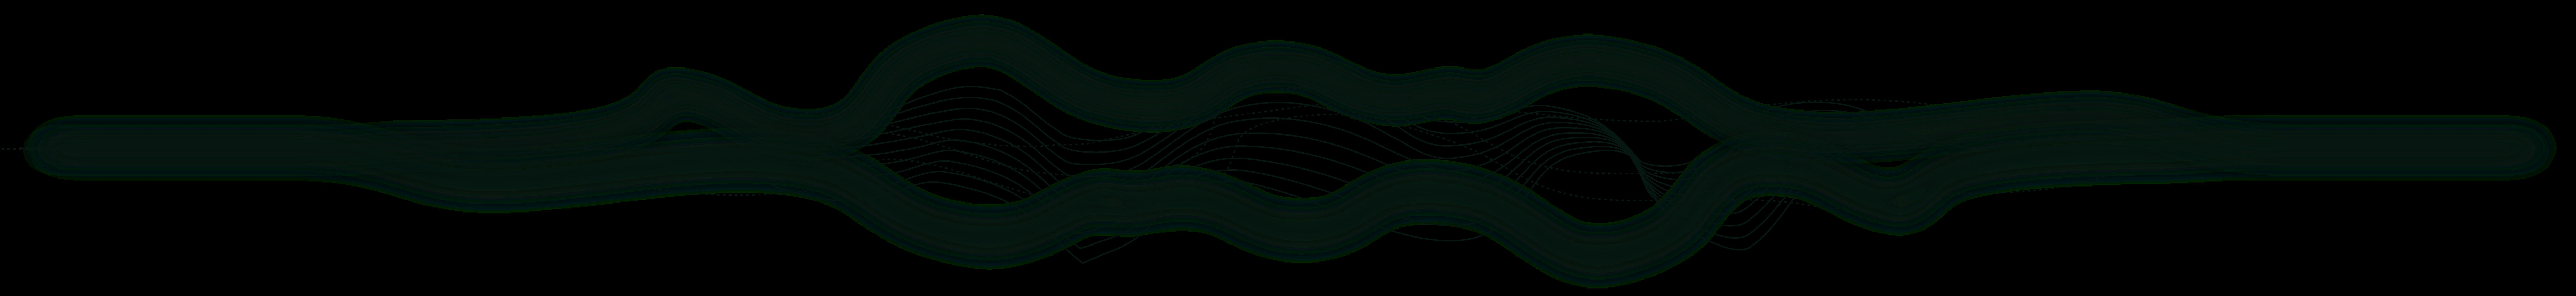 ArcoAcustica Isolamento Acustico